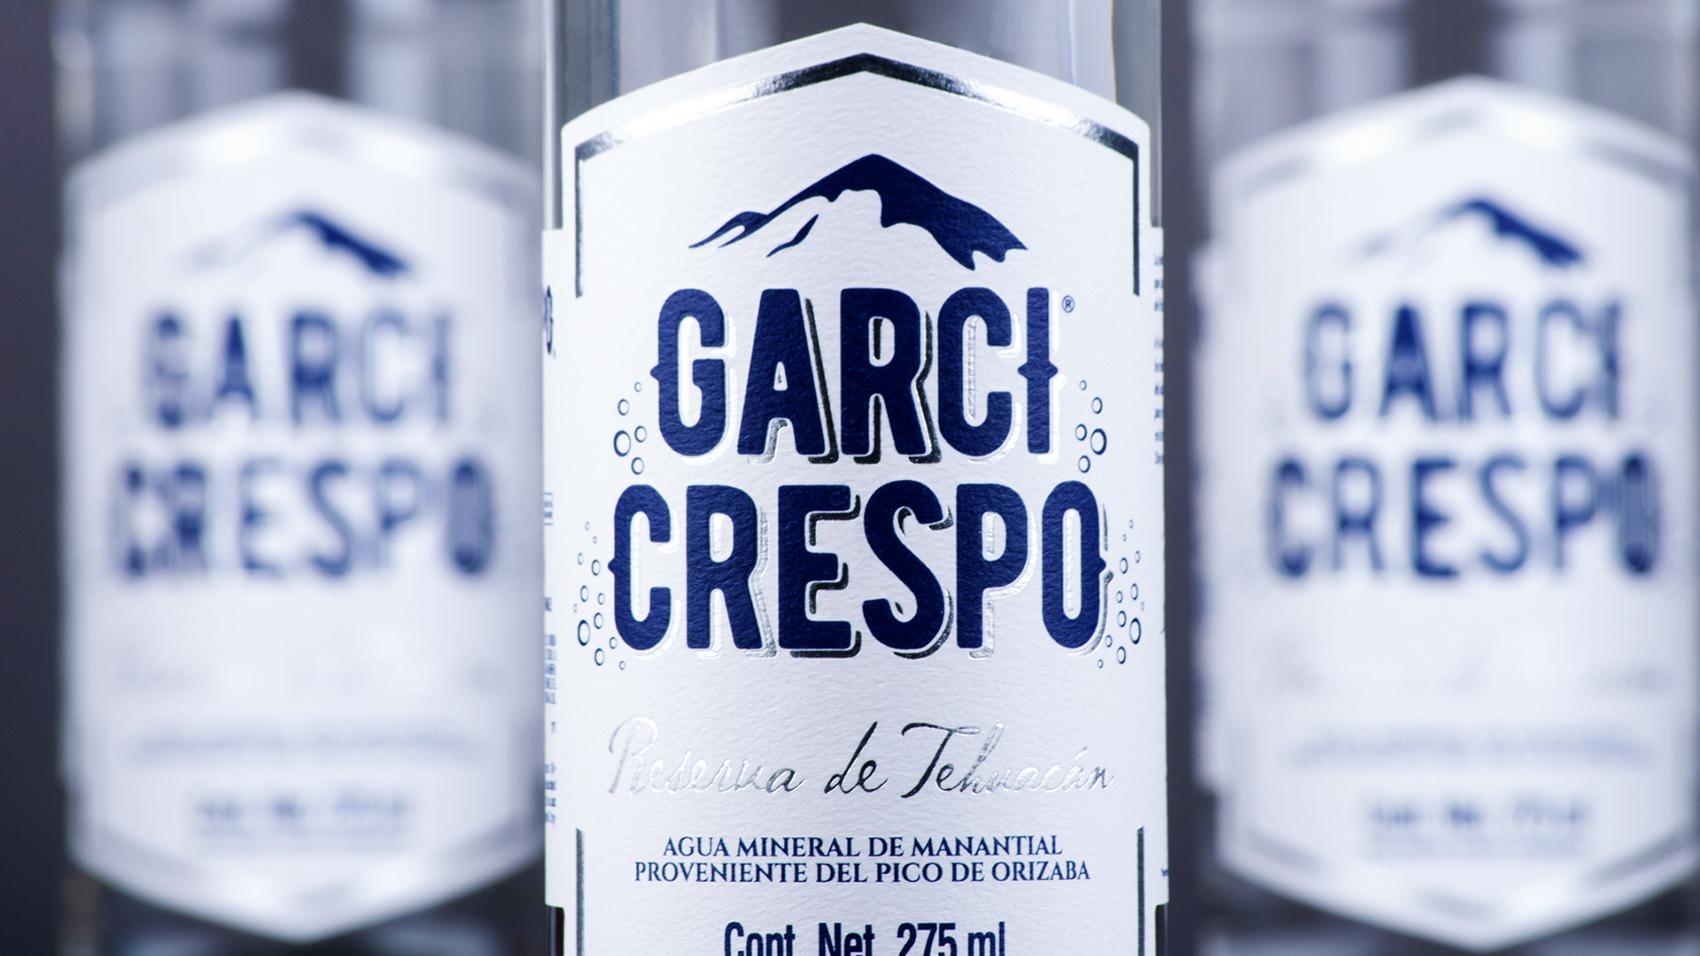 Garci Crespo